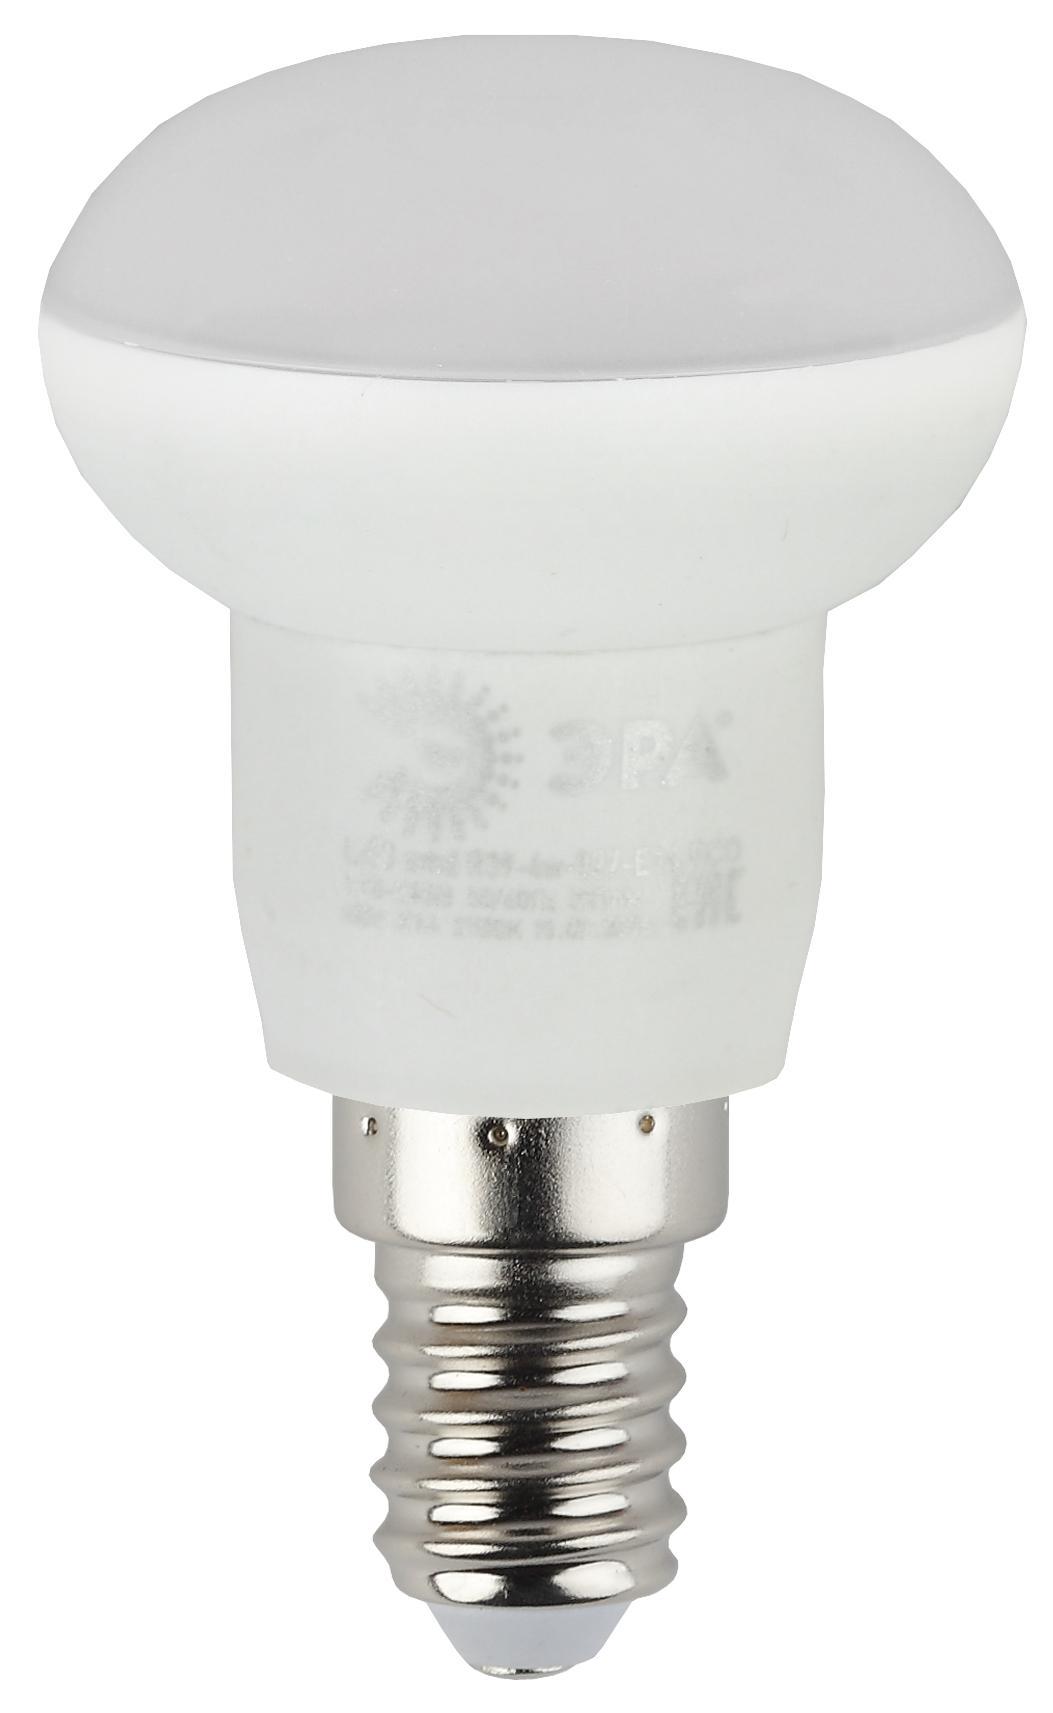 Лампа светодиодная ЭРА Led smd r39-4w-827-e14_eco